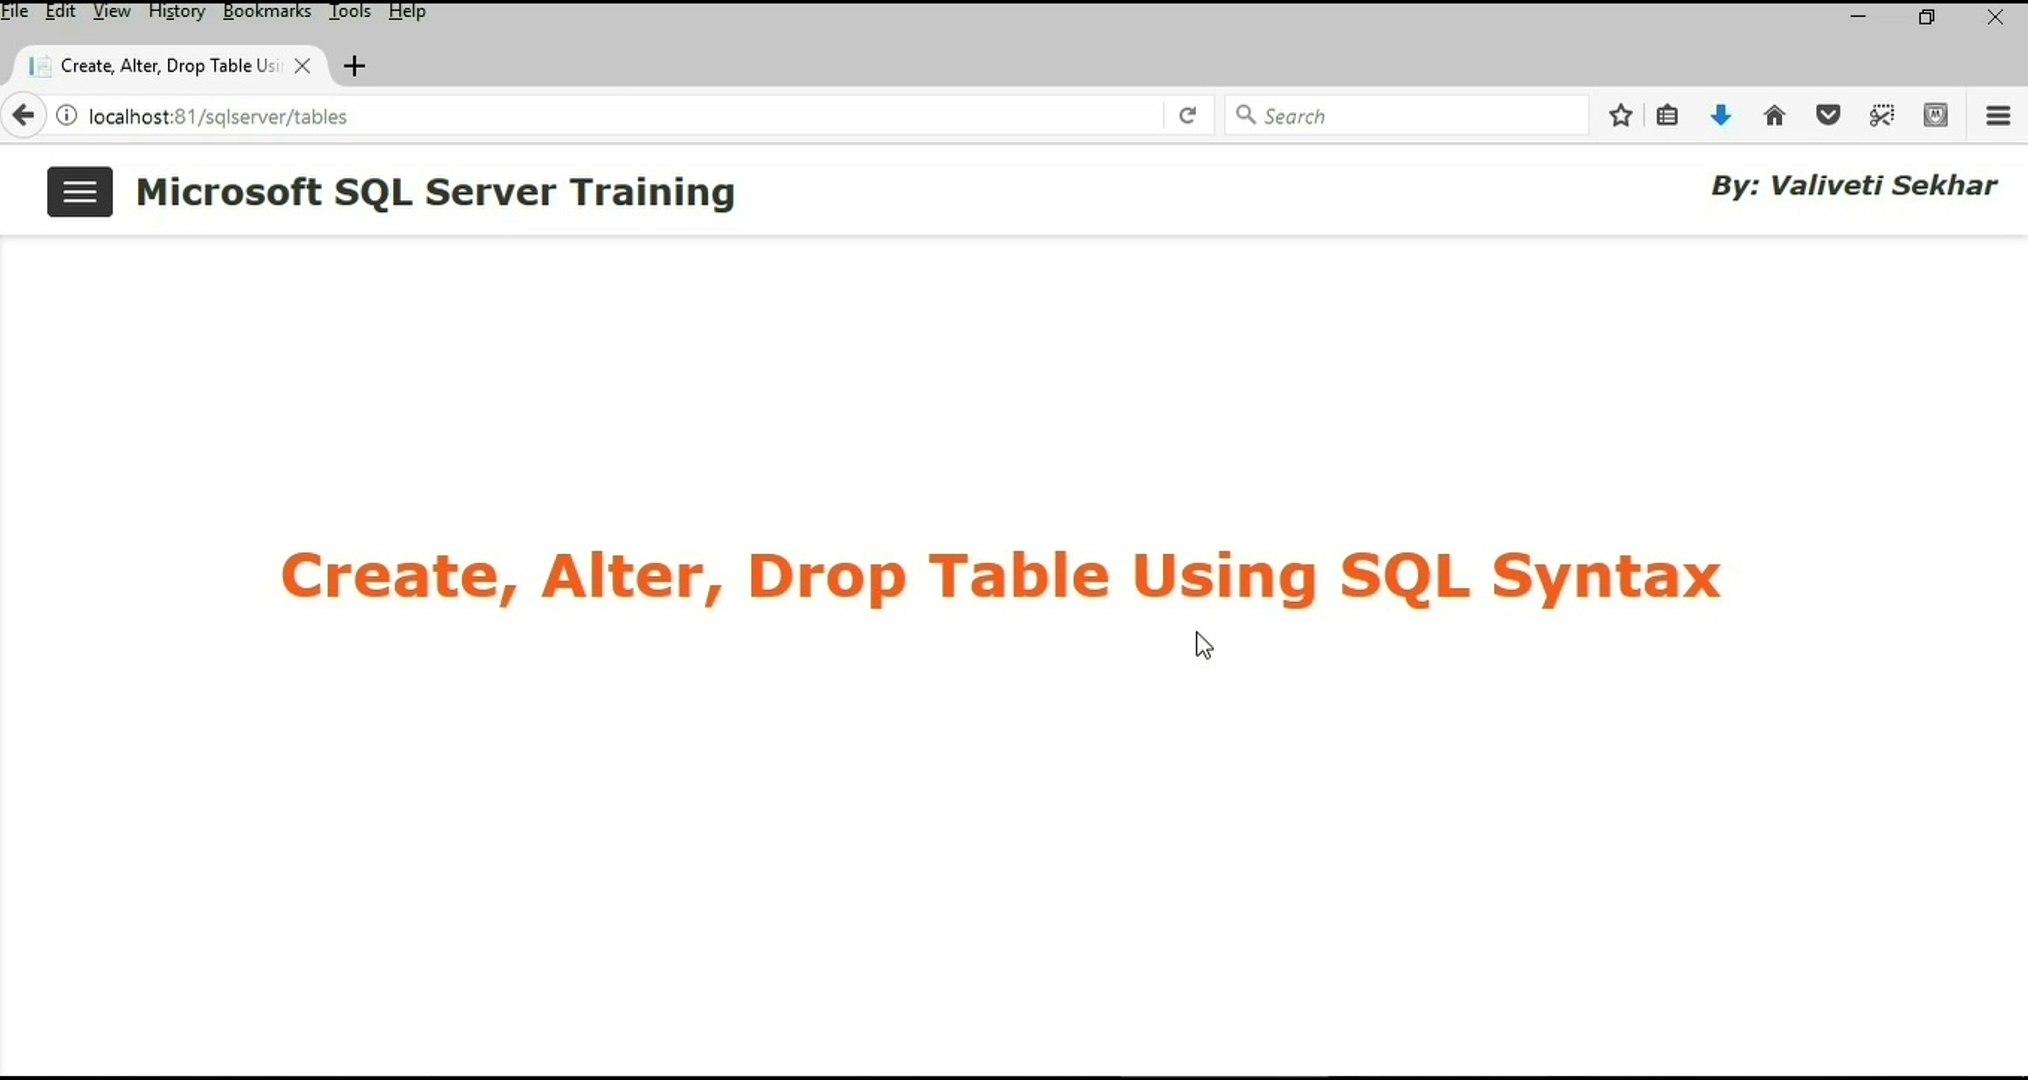 Microsoft Sql Server 2017 Training Create Alter Drop Table